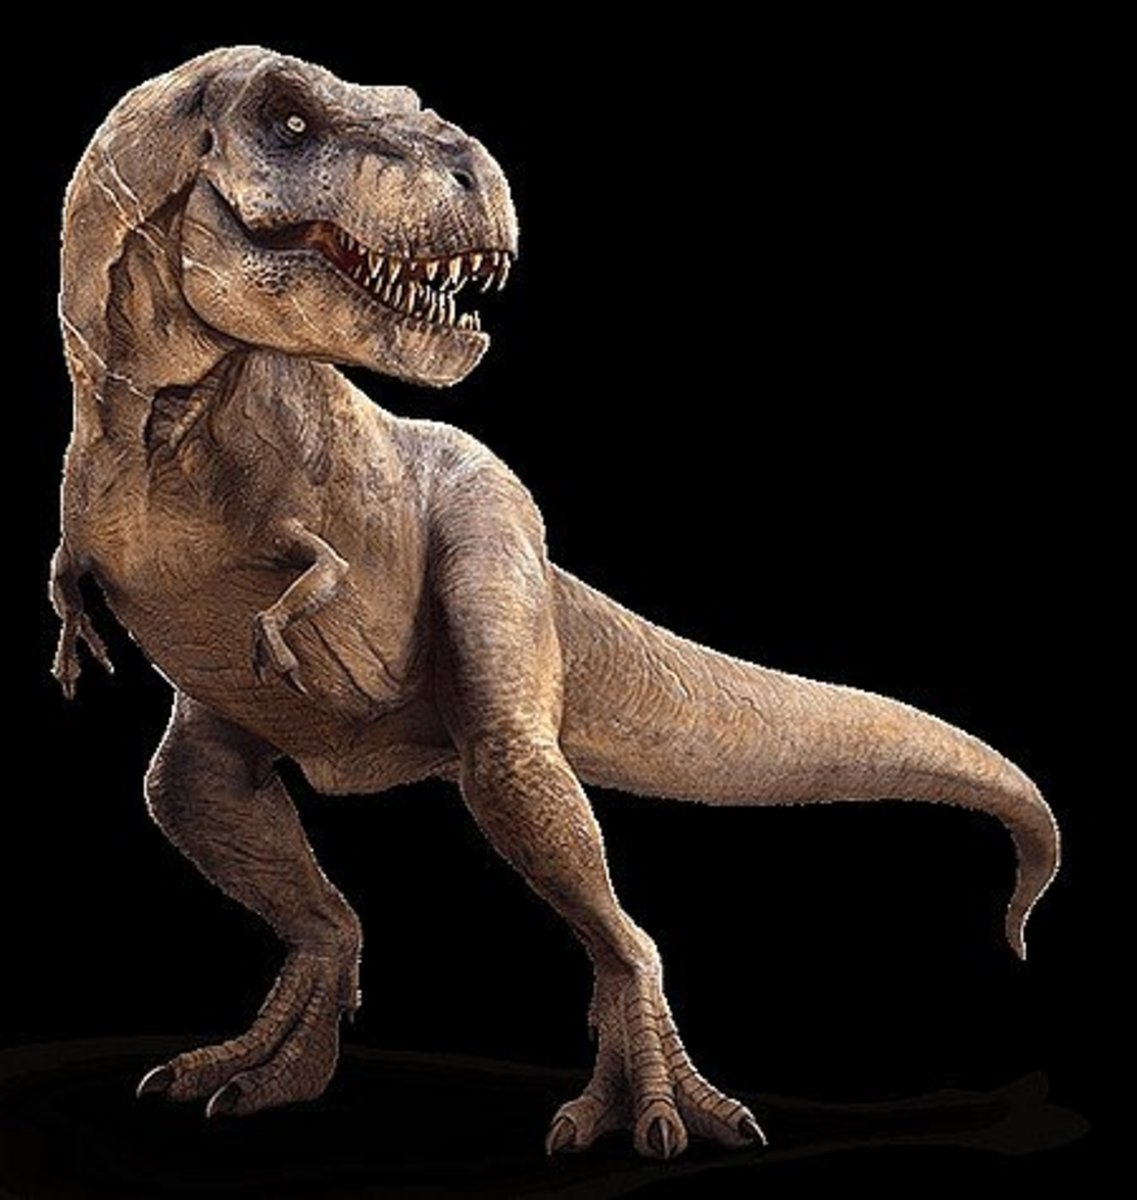 Tyrannosaurus Rex: Quick Facts